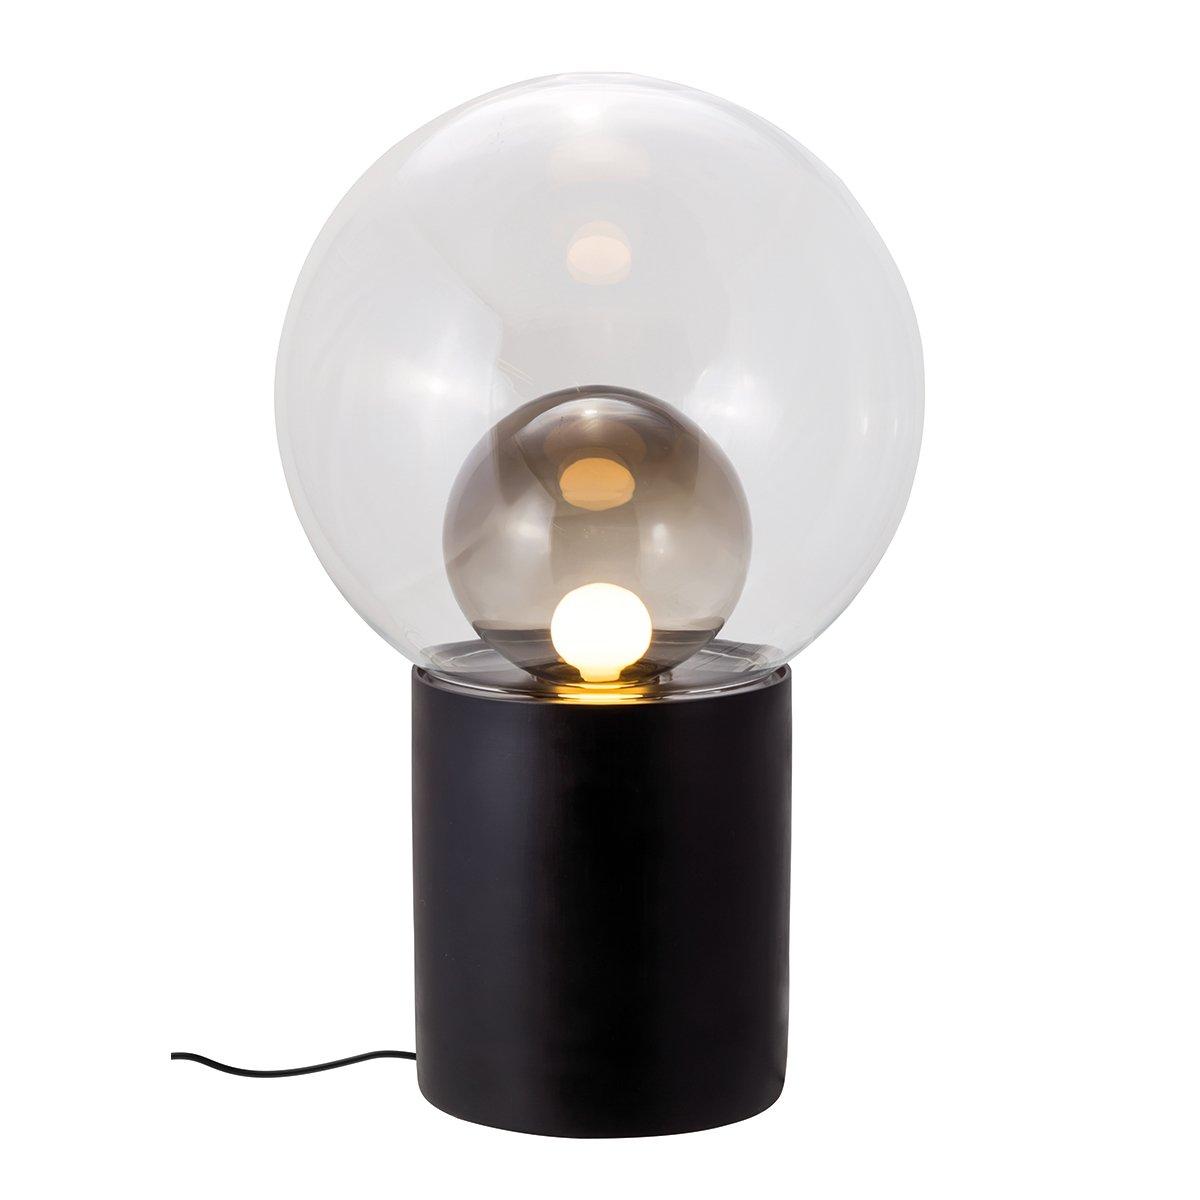 Pulpo Boule High Vloerlamp - Zwart - Transparant - Smoke Grey